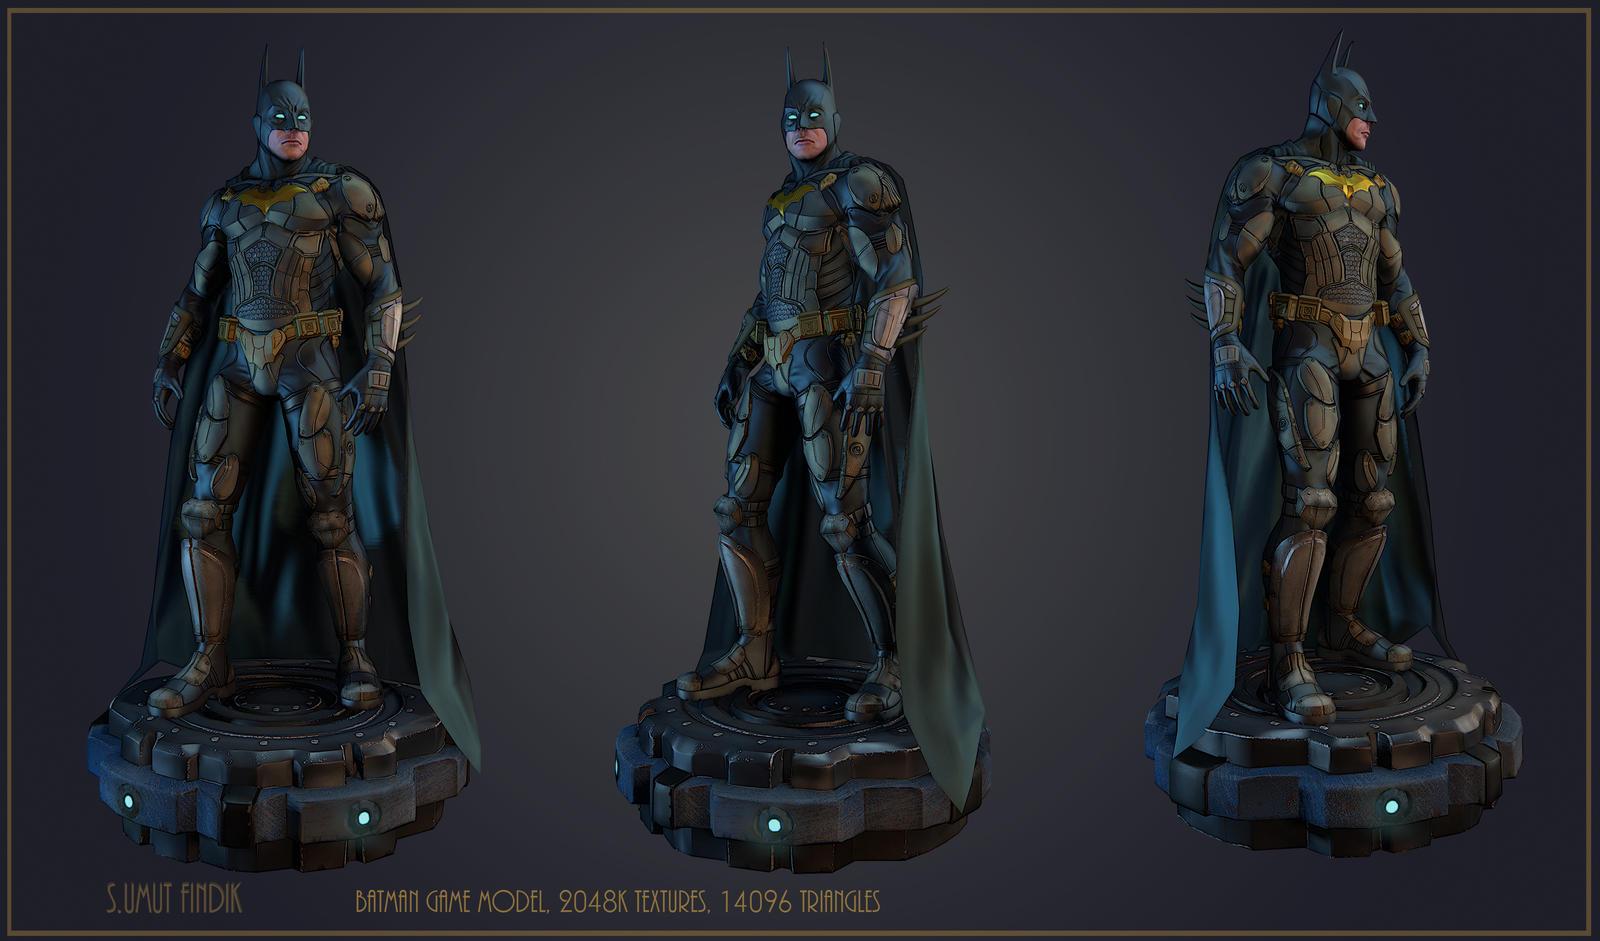 Batman Game Model by sumutf